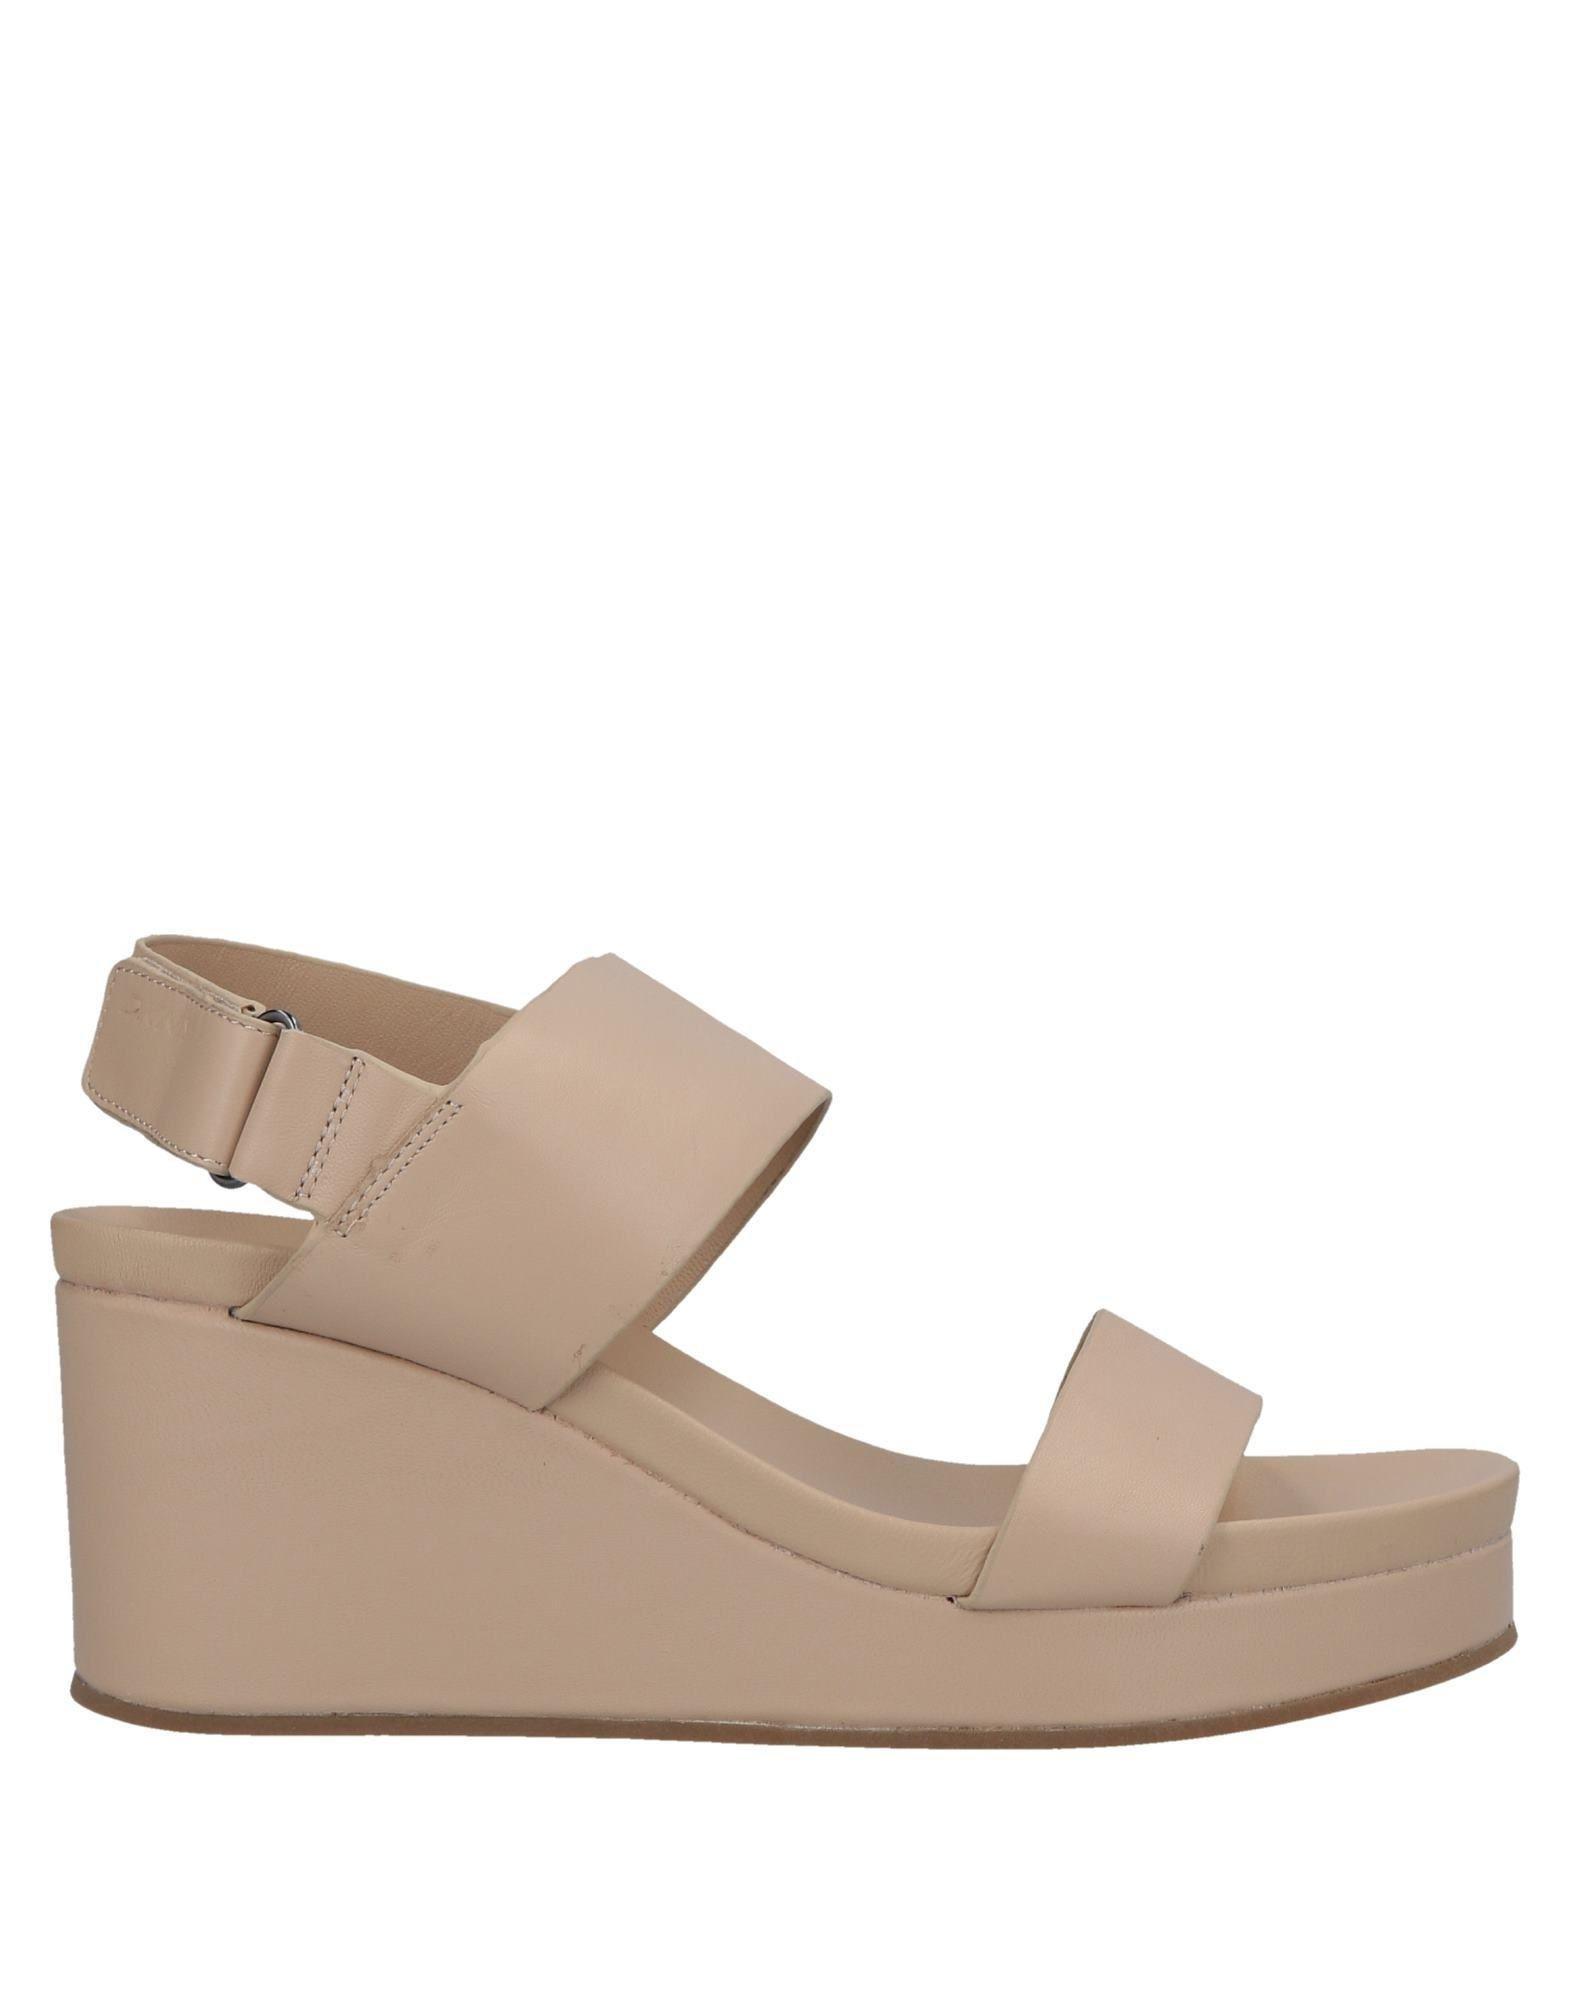 55ad36eccc1a DKNY. Women s Sandals